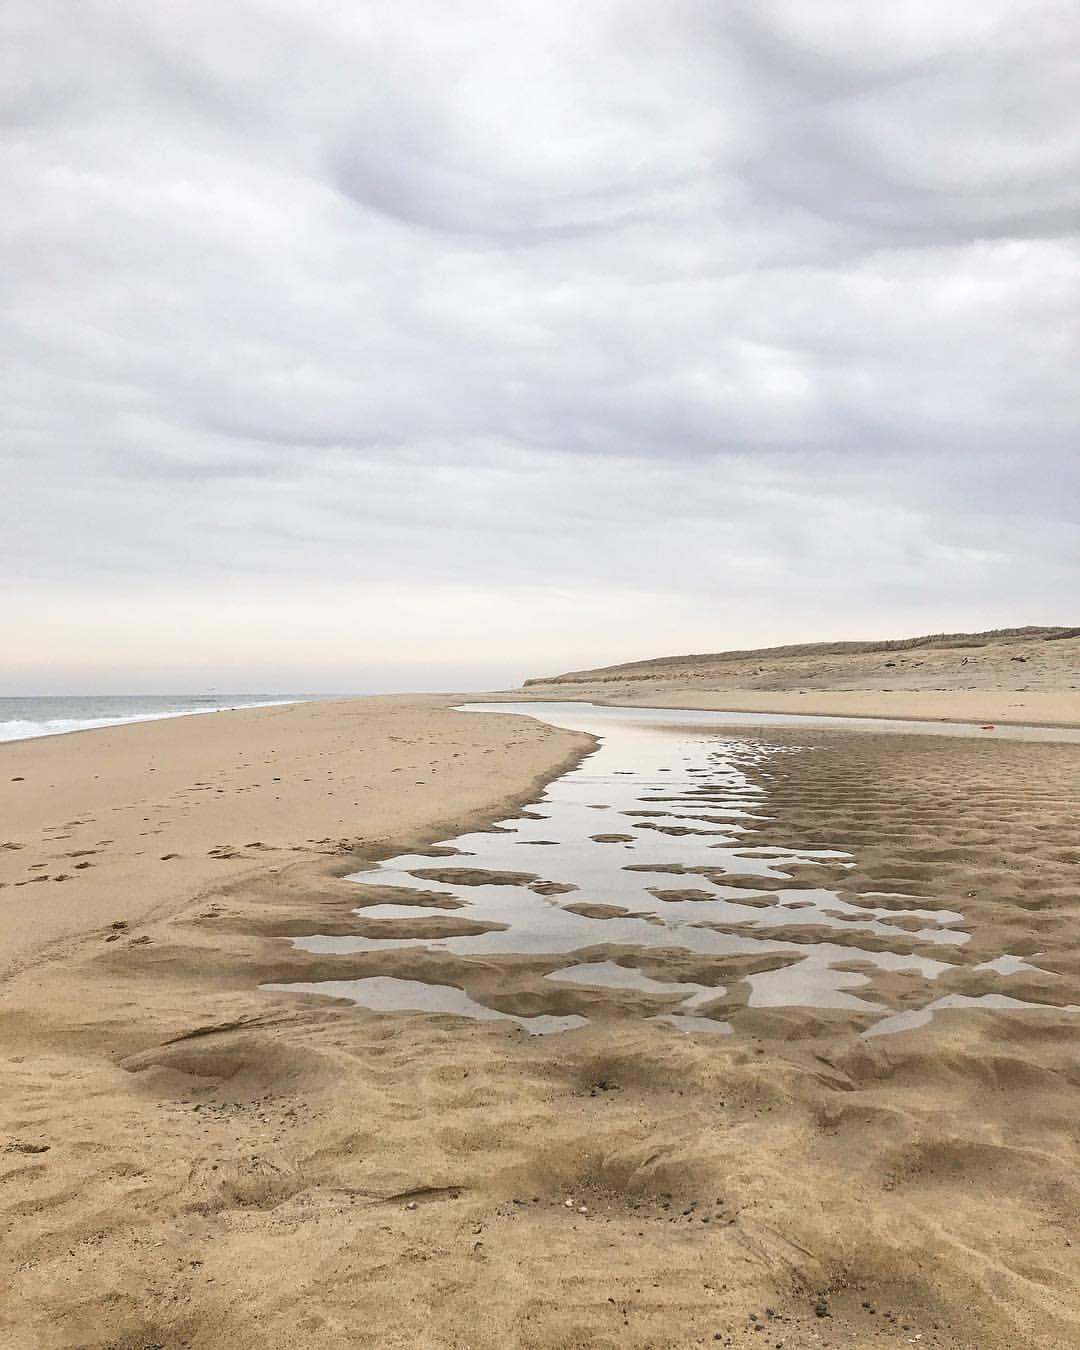 Sandbar reveal.  -  #massachusetts #capecod #provincetown #beachcombing  (at Race Point Beach)